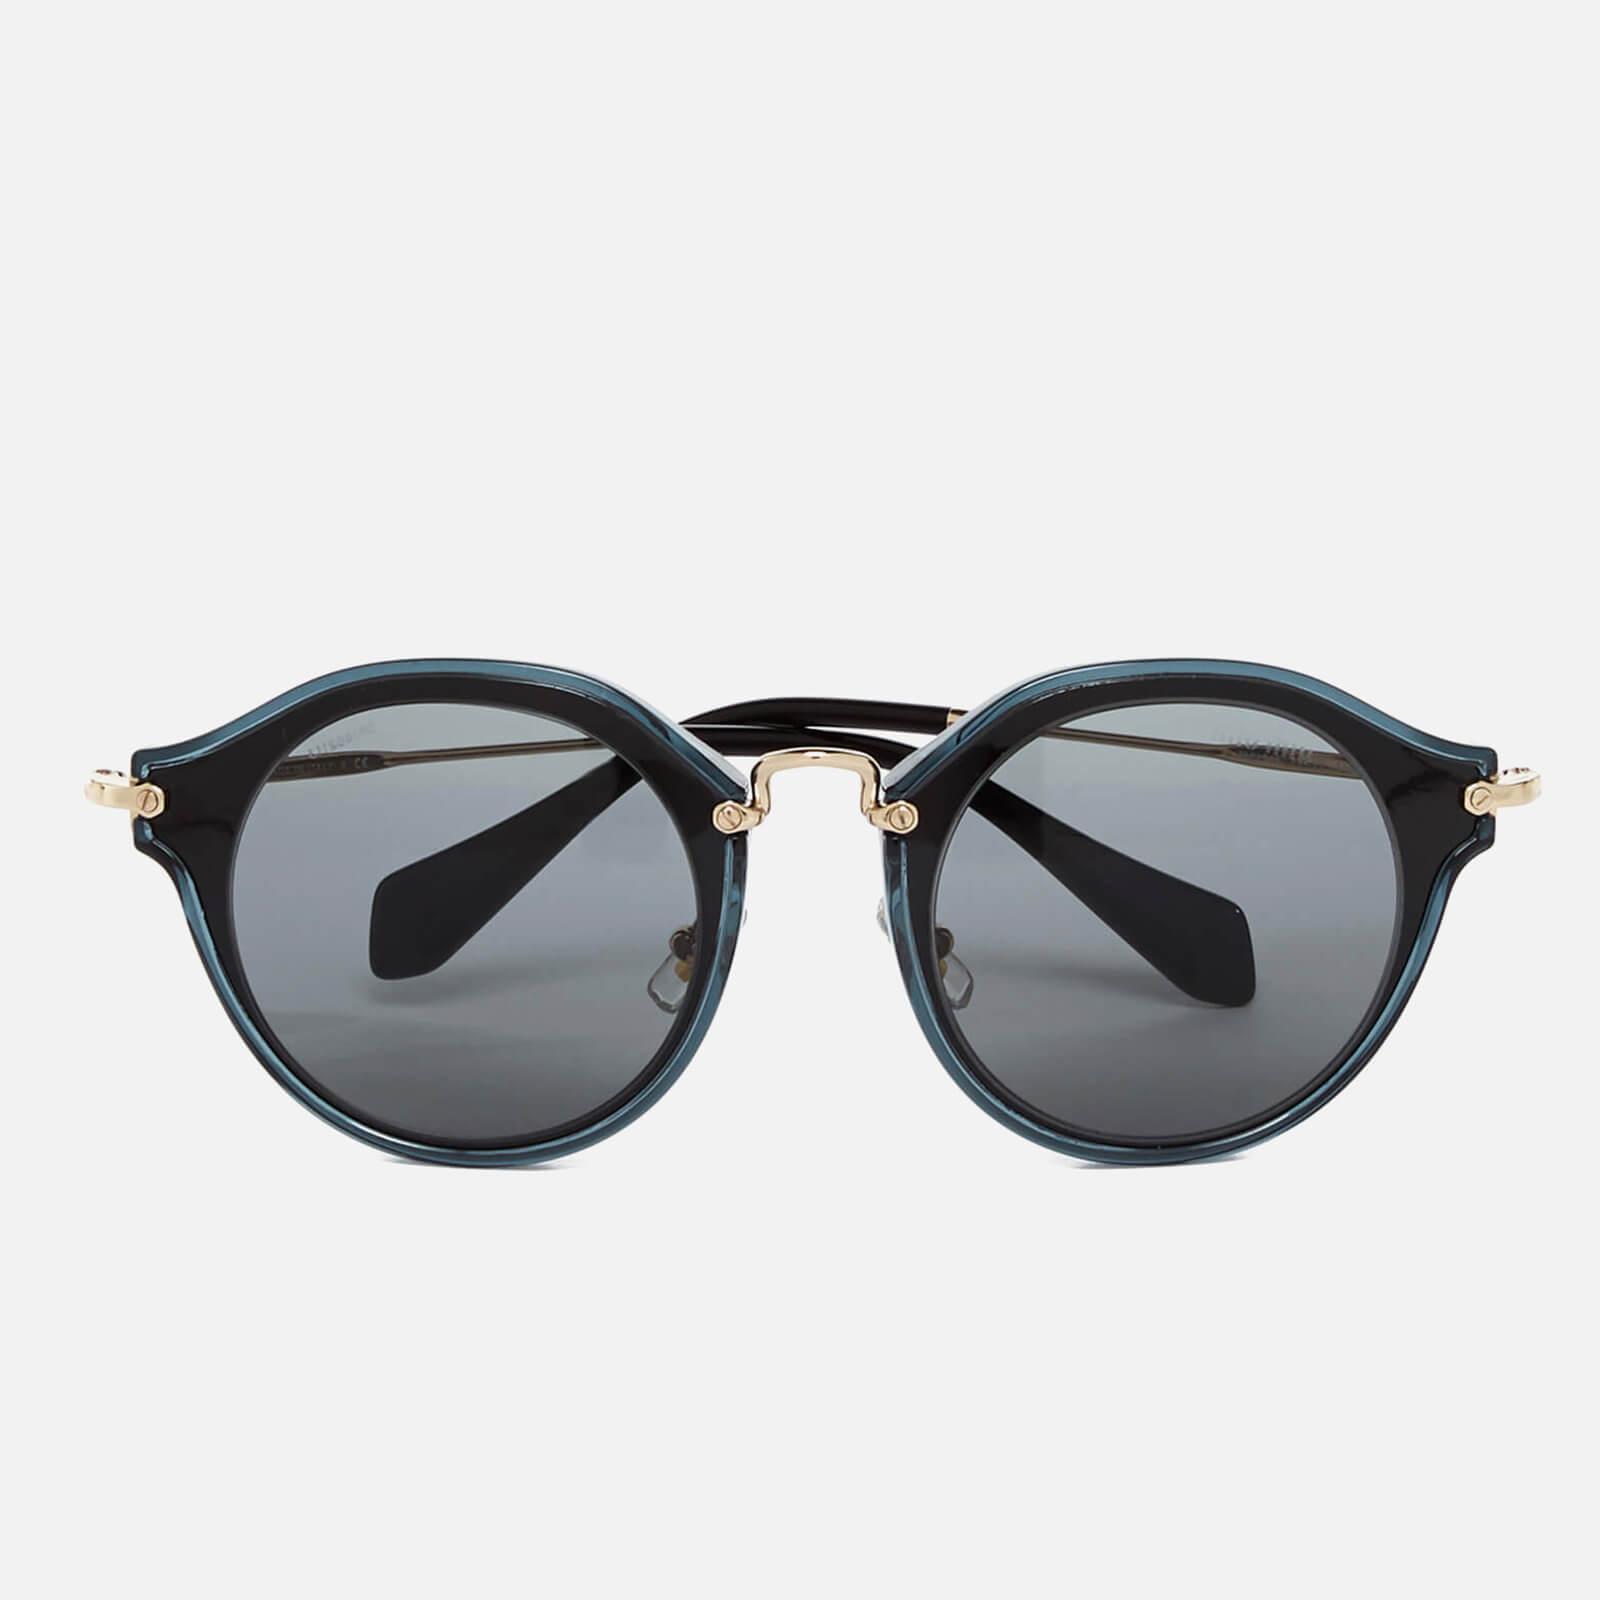 00b8ff103e19 Miu Miu Women's Noir Metal Rim Frame Sunglasses - Black